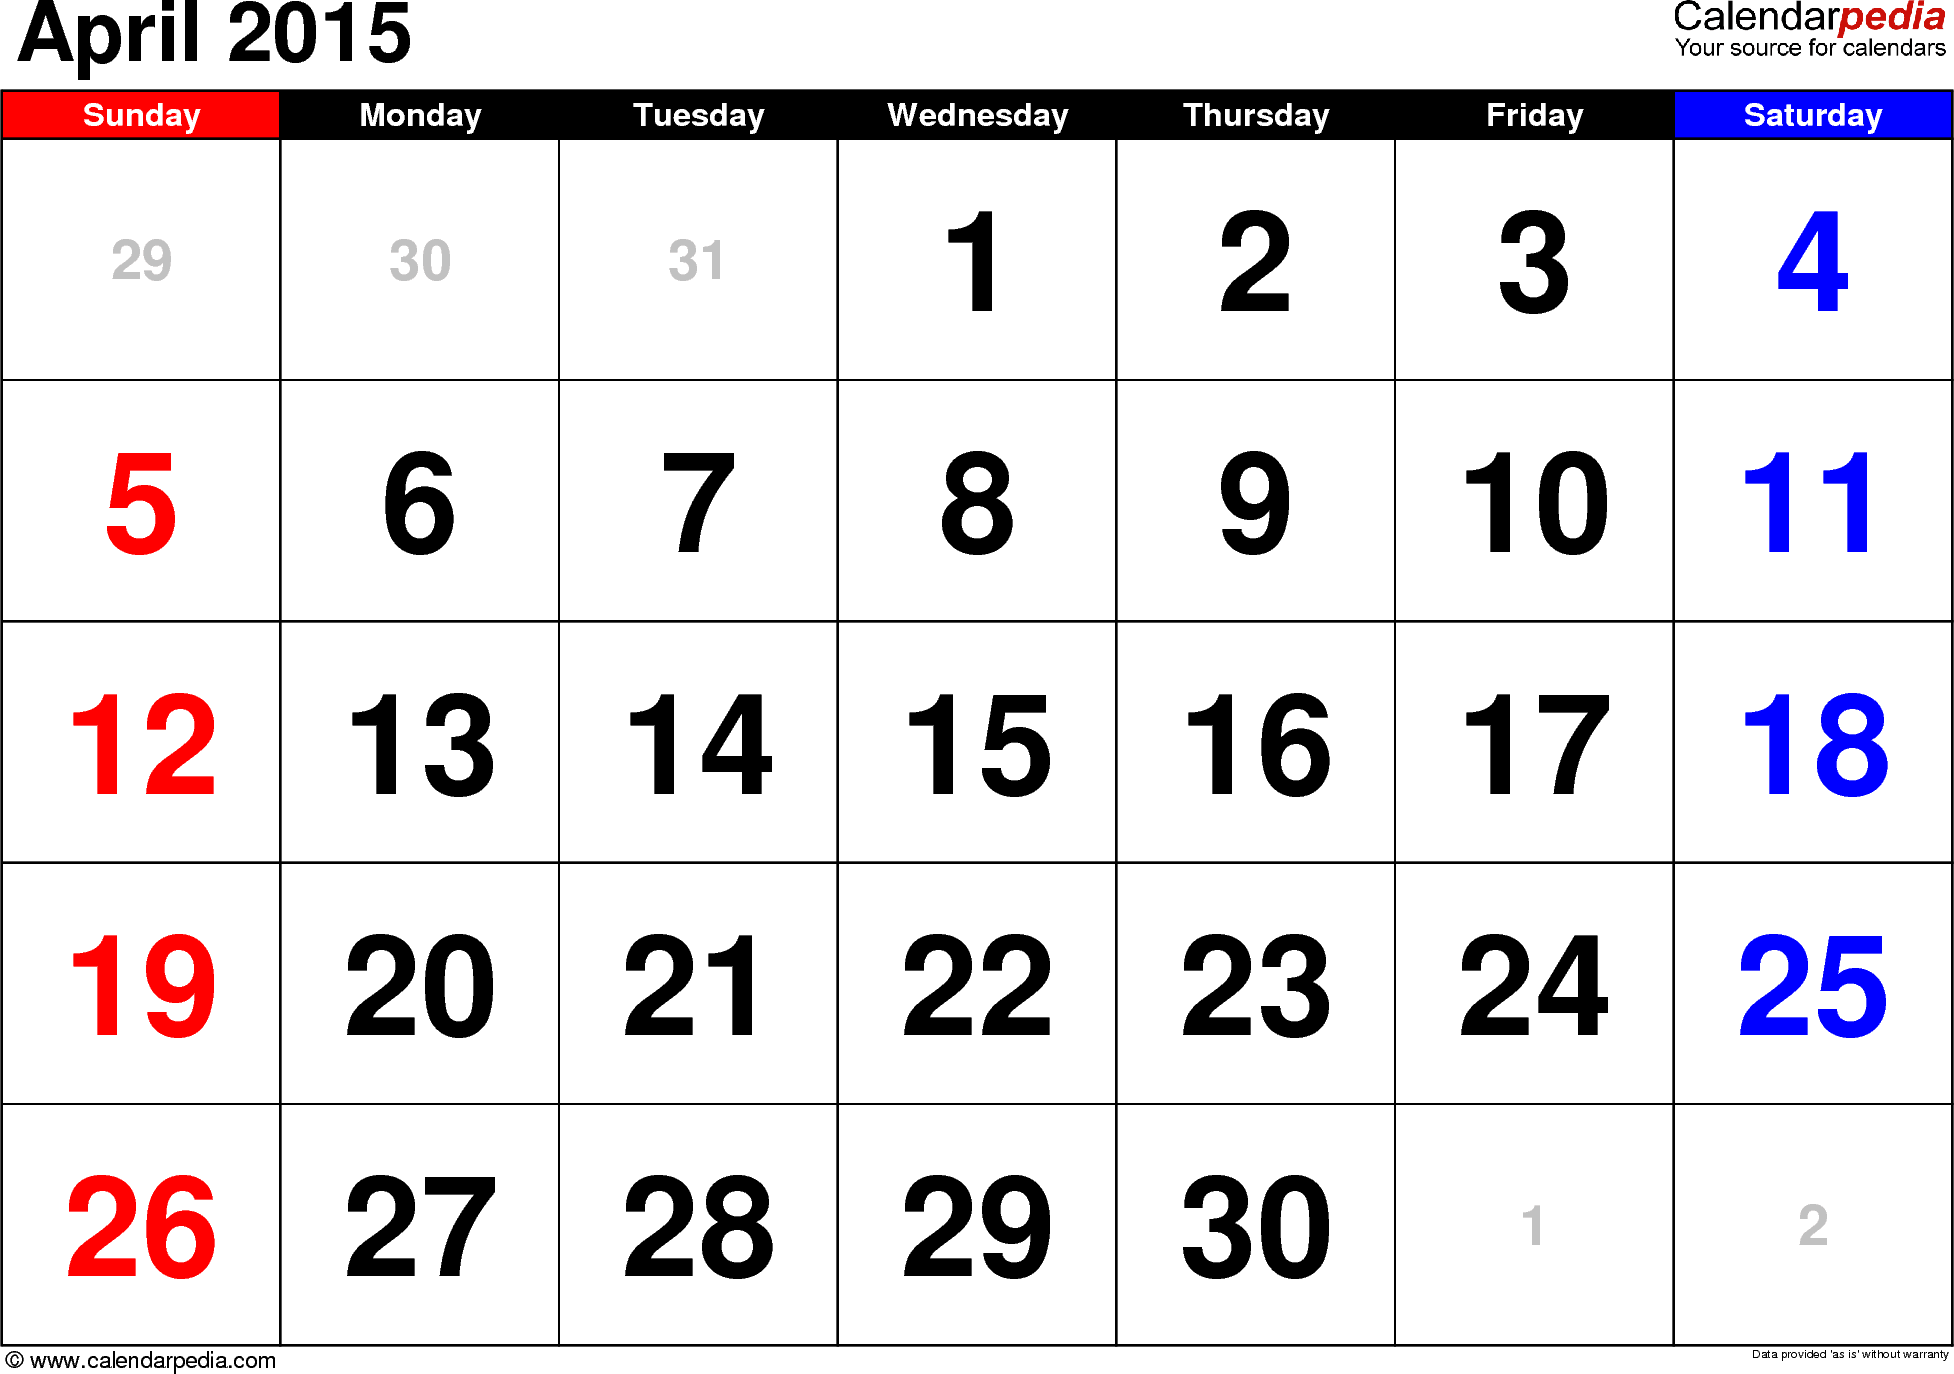 april calendar 2015 template.